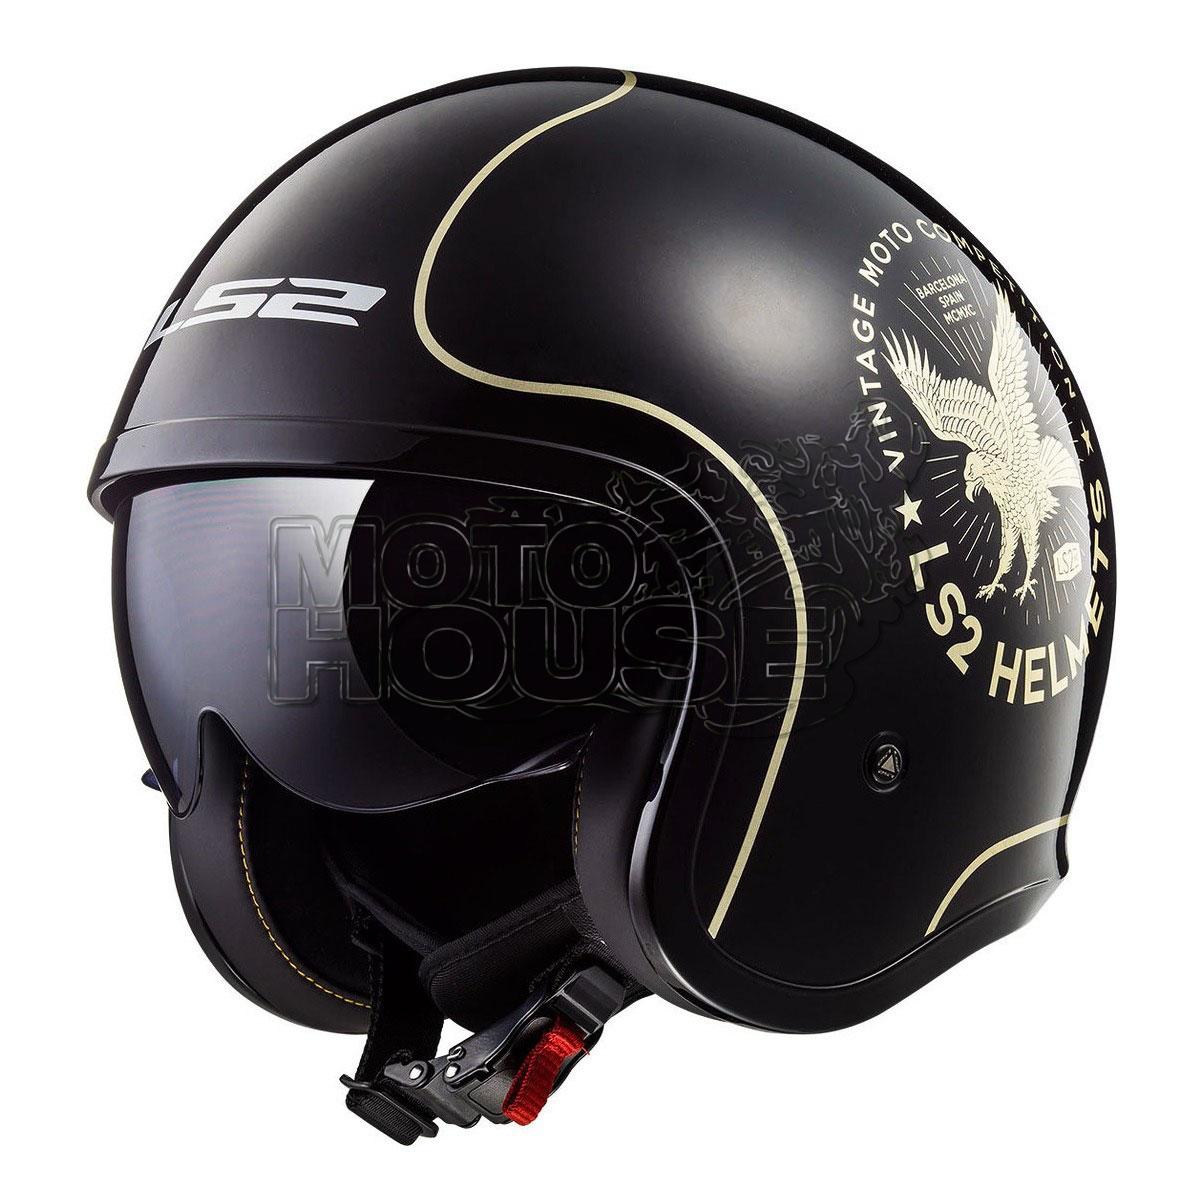 Casco Jet Motociclismo Ls2 Of599 Spitfire Flier Negro